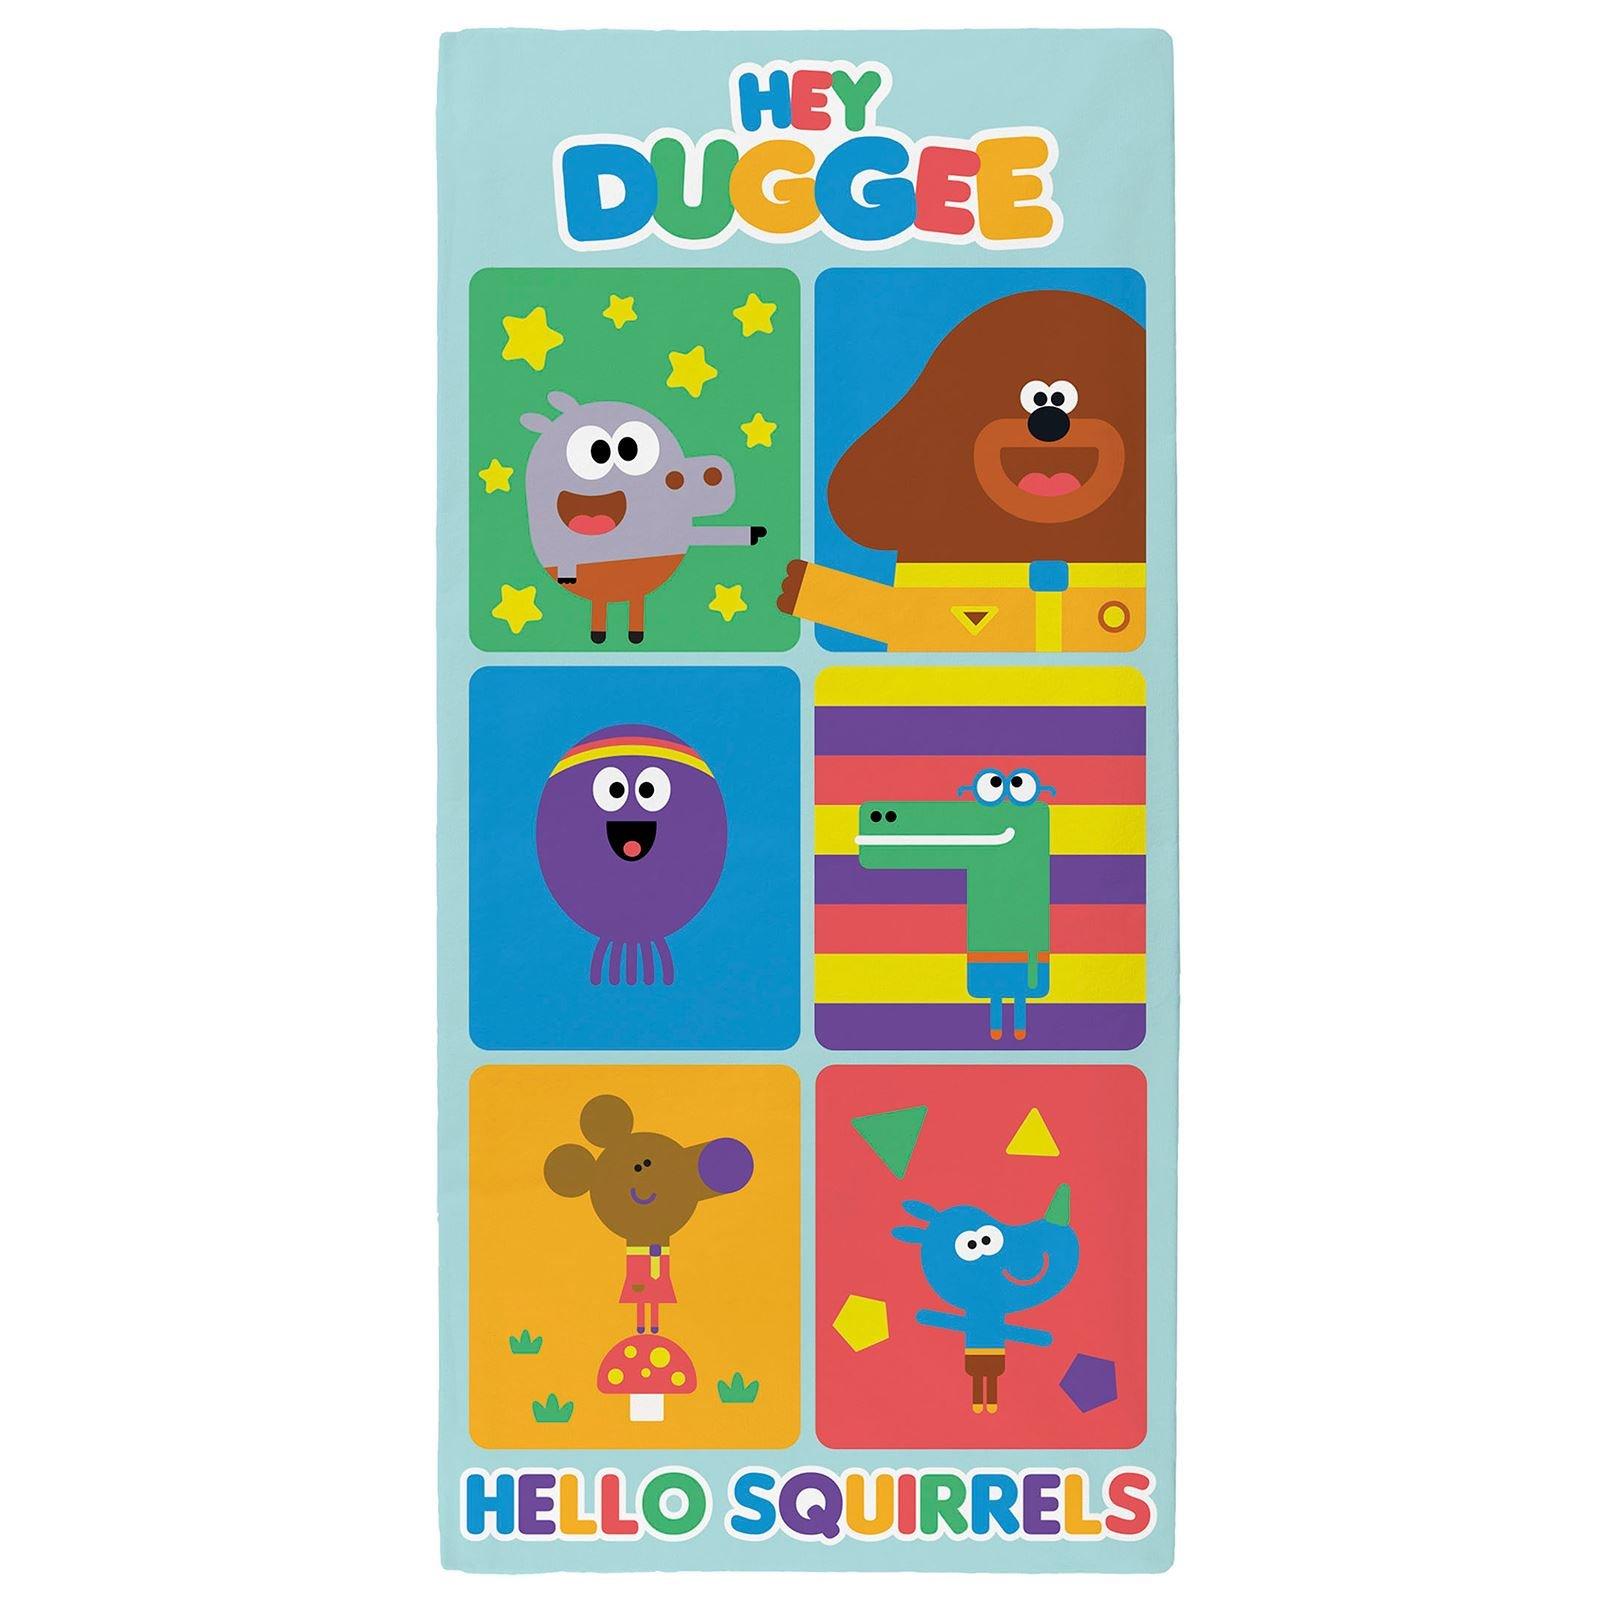 Hey Duggee Hello Squirrels' Towel, Cotton, Multi-colour, 70 x 0.5 x 140cm